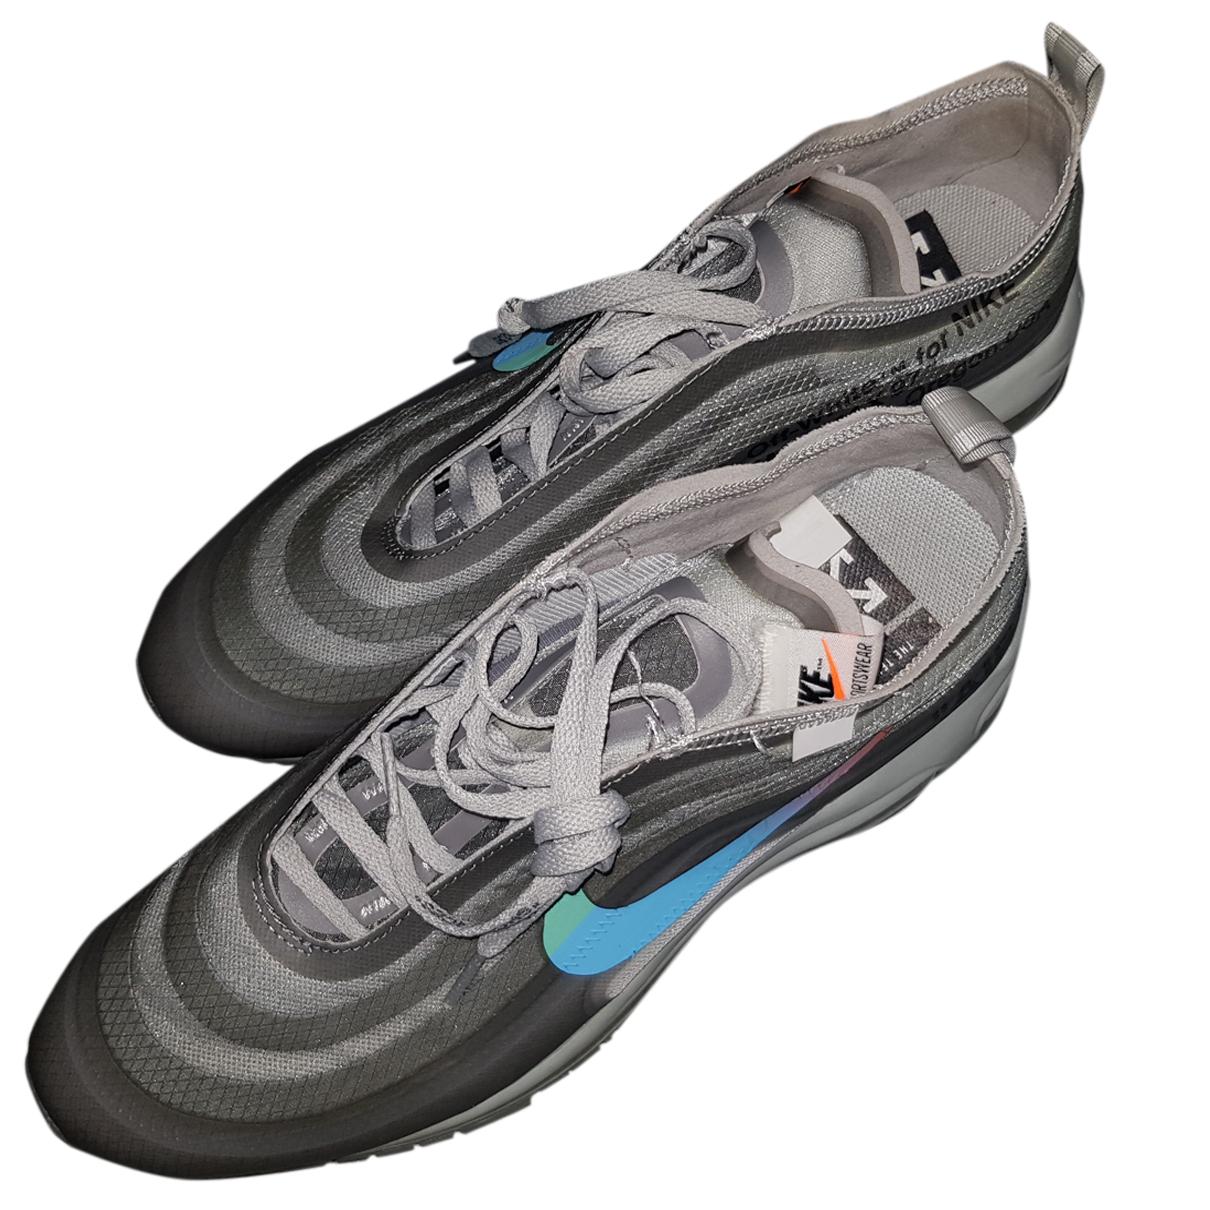 Nike X Off-white - Baskets Air max 97 pour homme en toile - gris